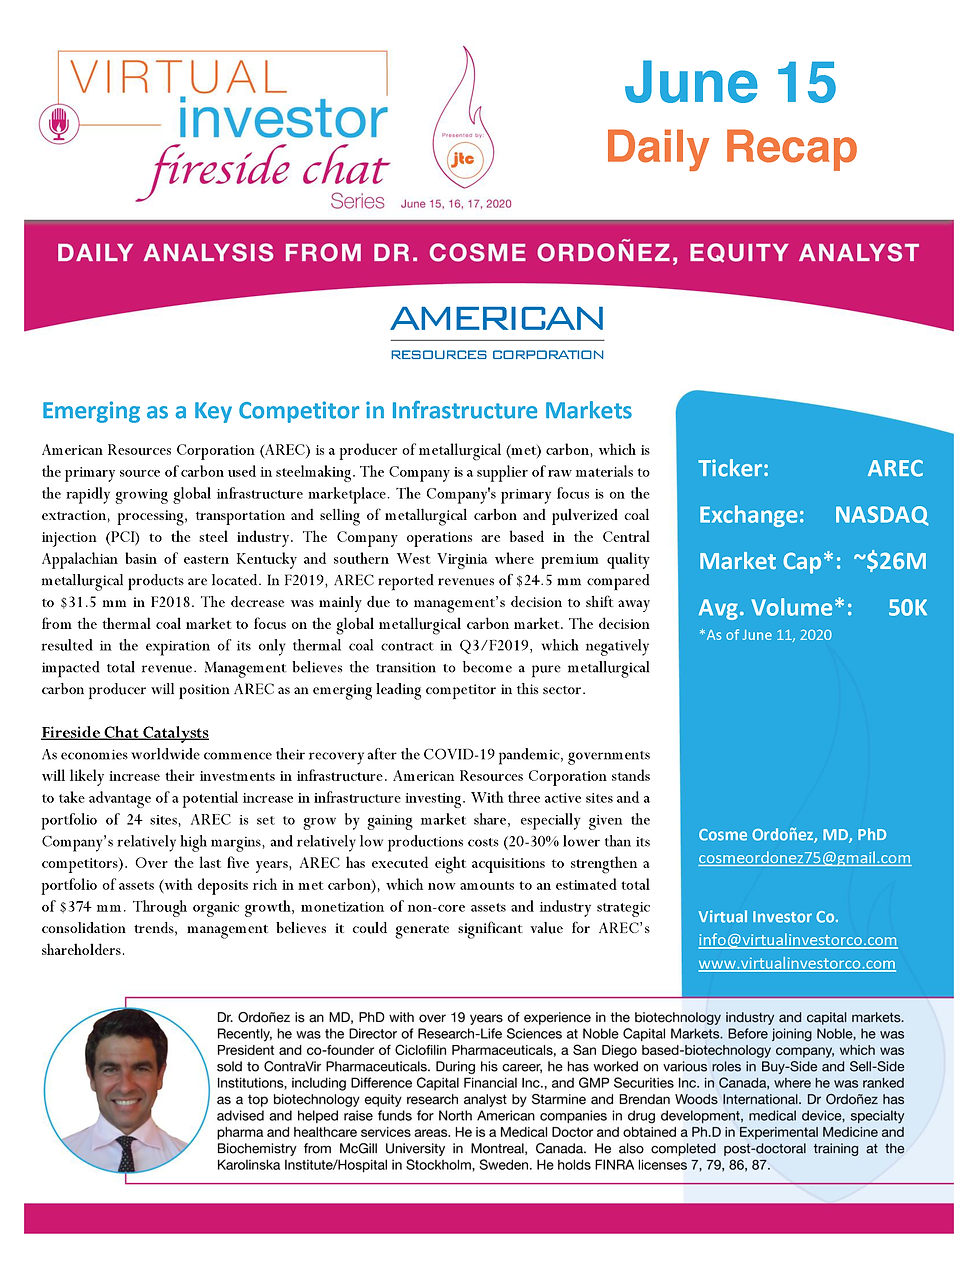 VIFireside Chat Daily Recap 2020_America